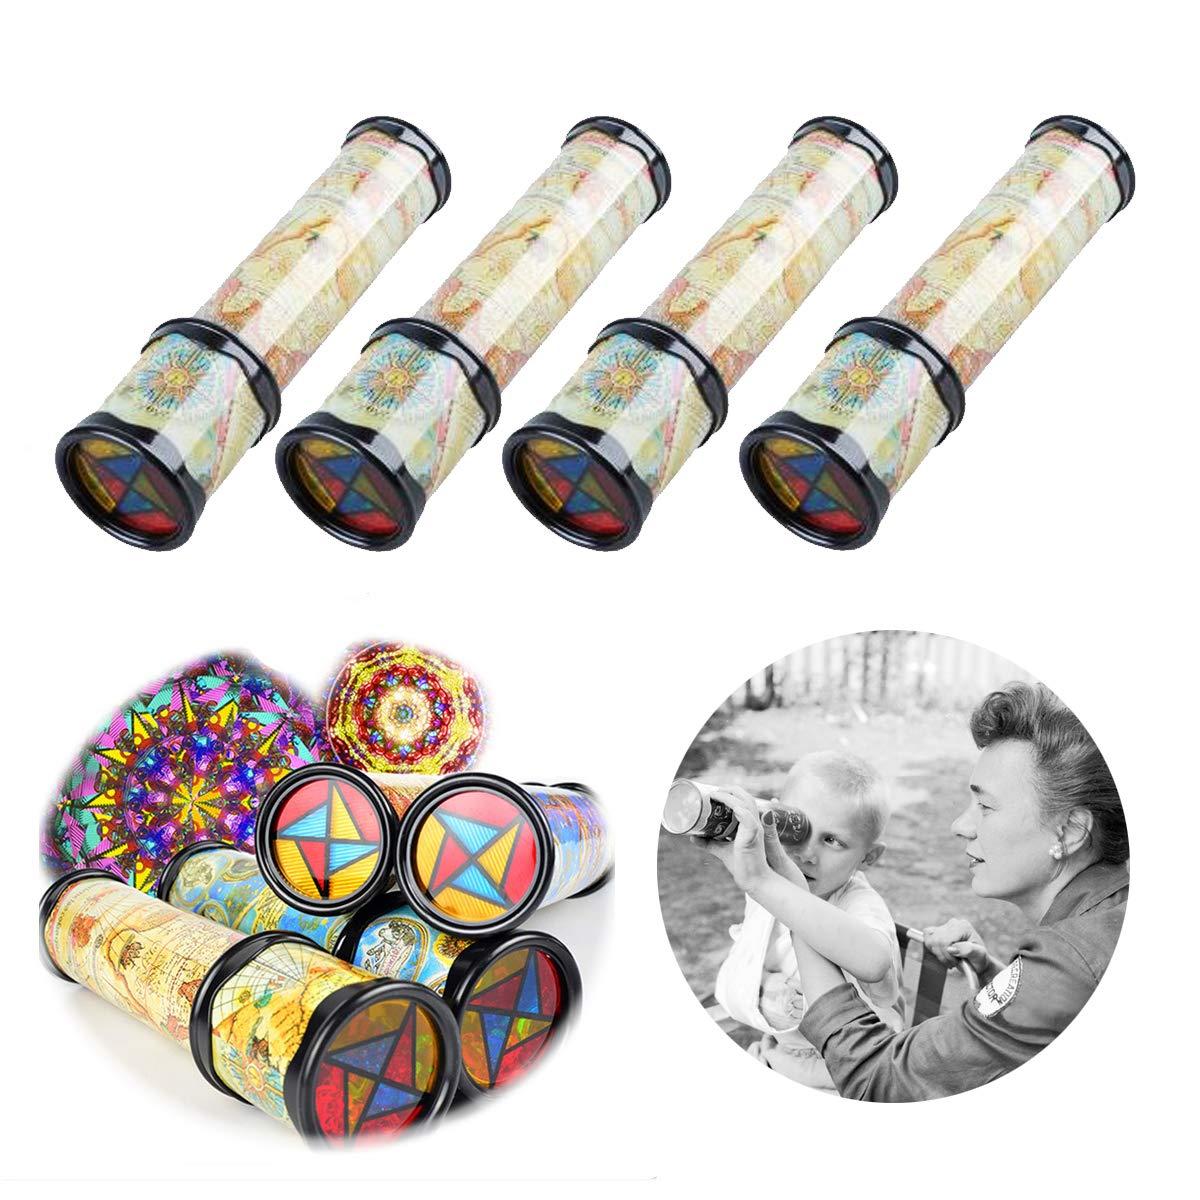 DLOnline 4PCS Old World Kaleidoscope, Magic Classic Toy for Children Kaleidoscope,Classic Toys,Magic Toys,Kaleidoscope Toy,Children Toys,Kaleidoscope for Children,Classic World Toys,Classic World by DLOnline